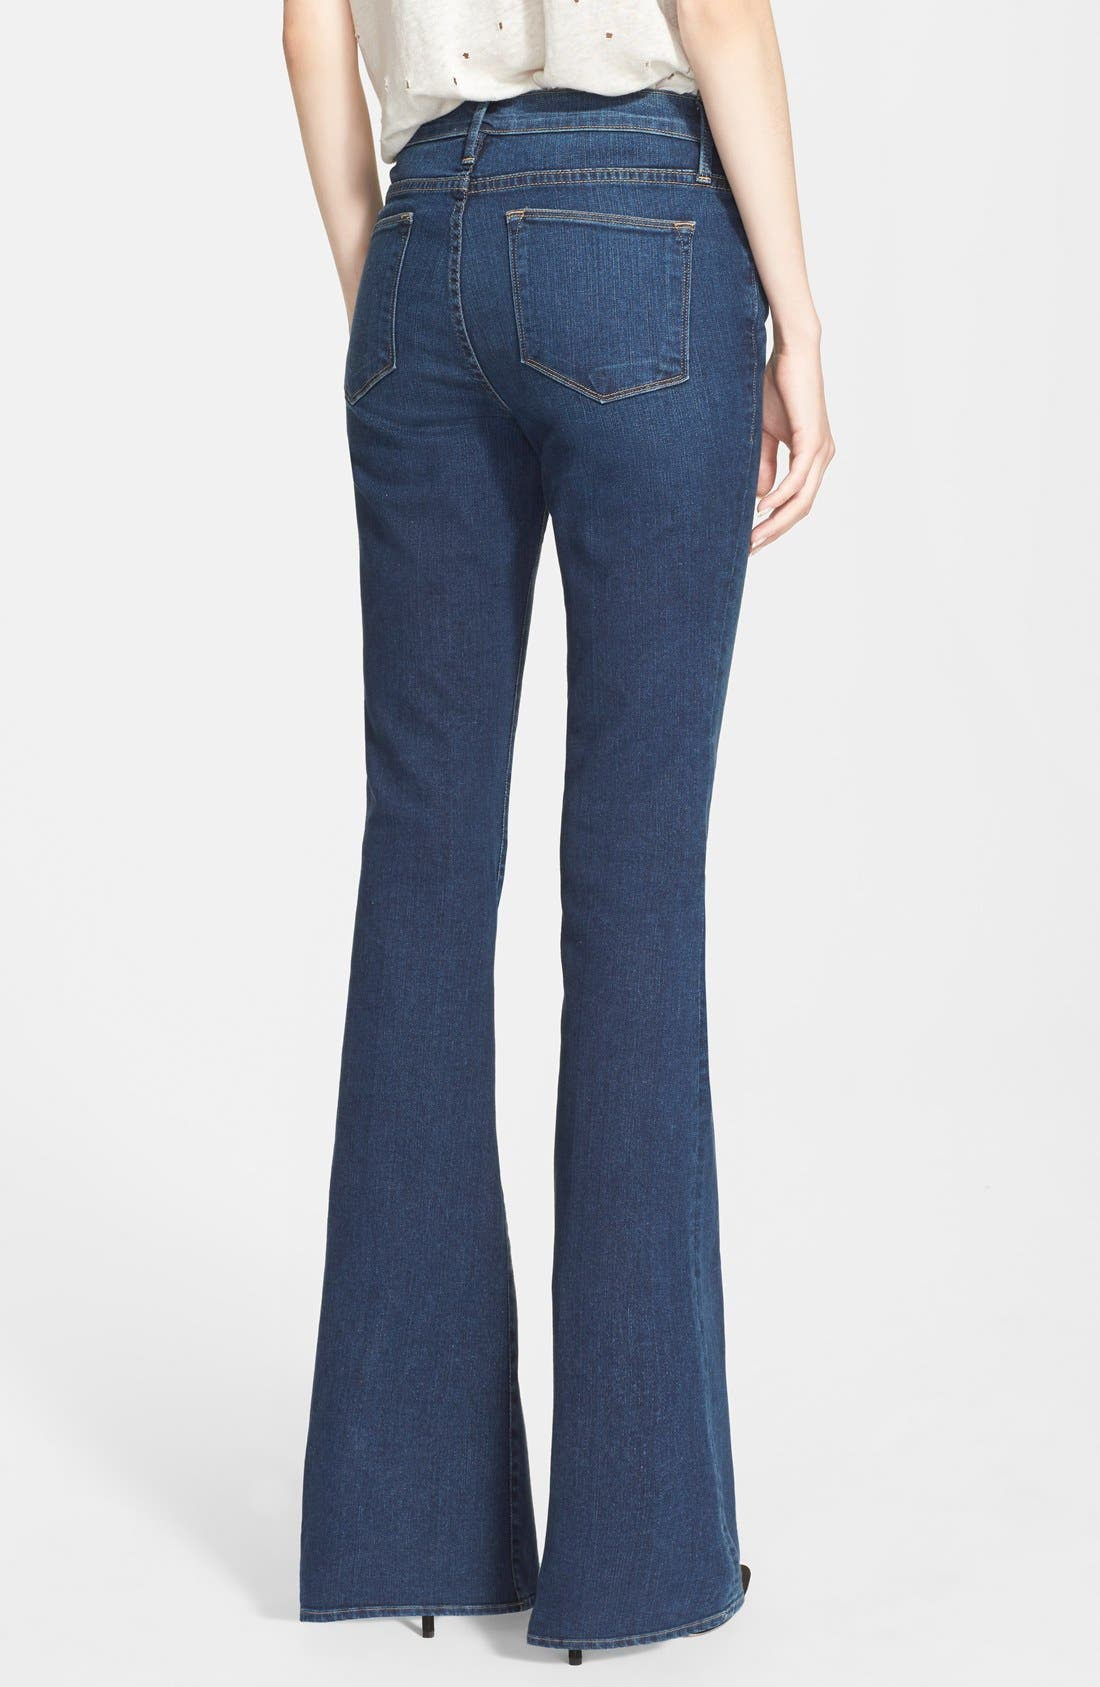 Denim 'Le High Flare' Flare Leg Jeans,                             Alternate thumbnail 6, color,                             401